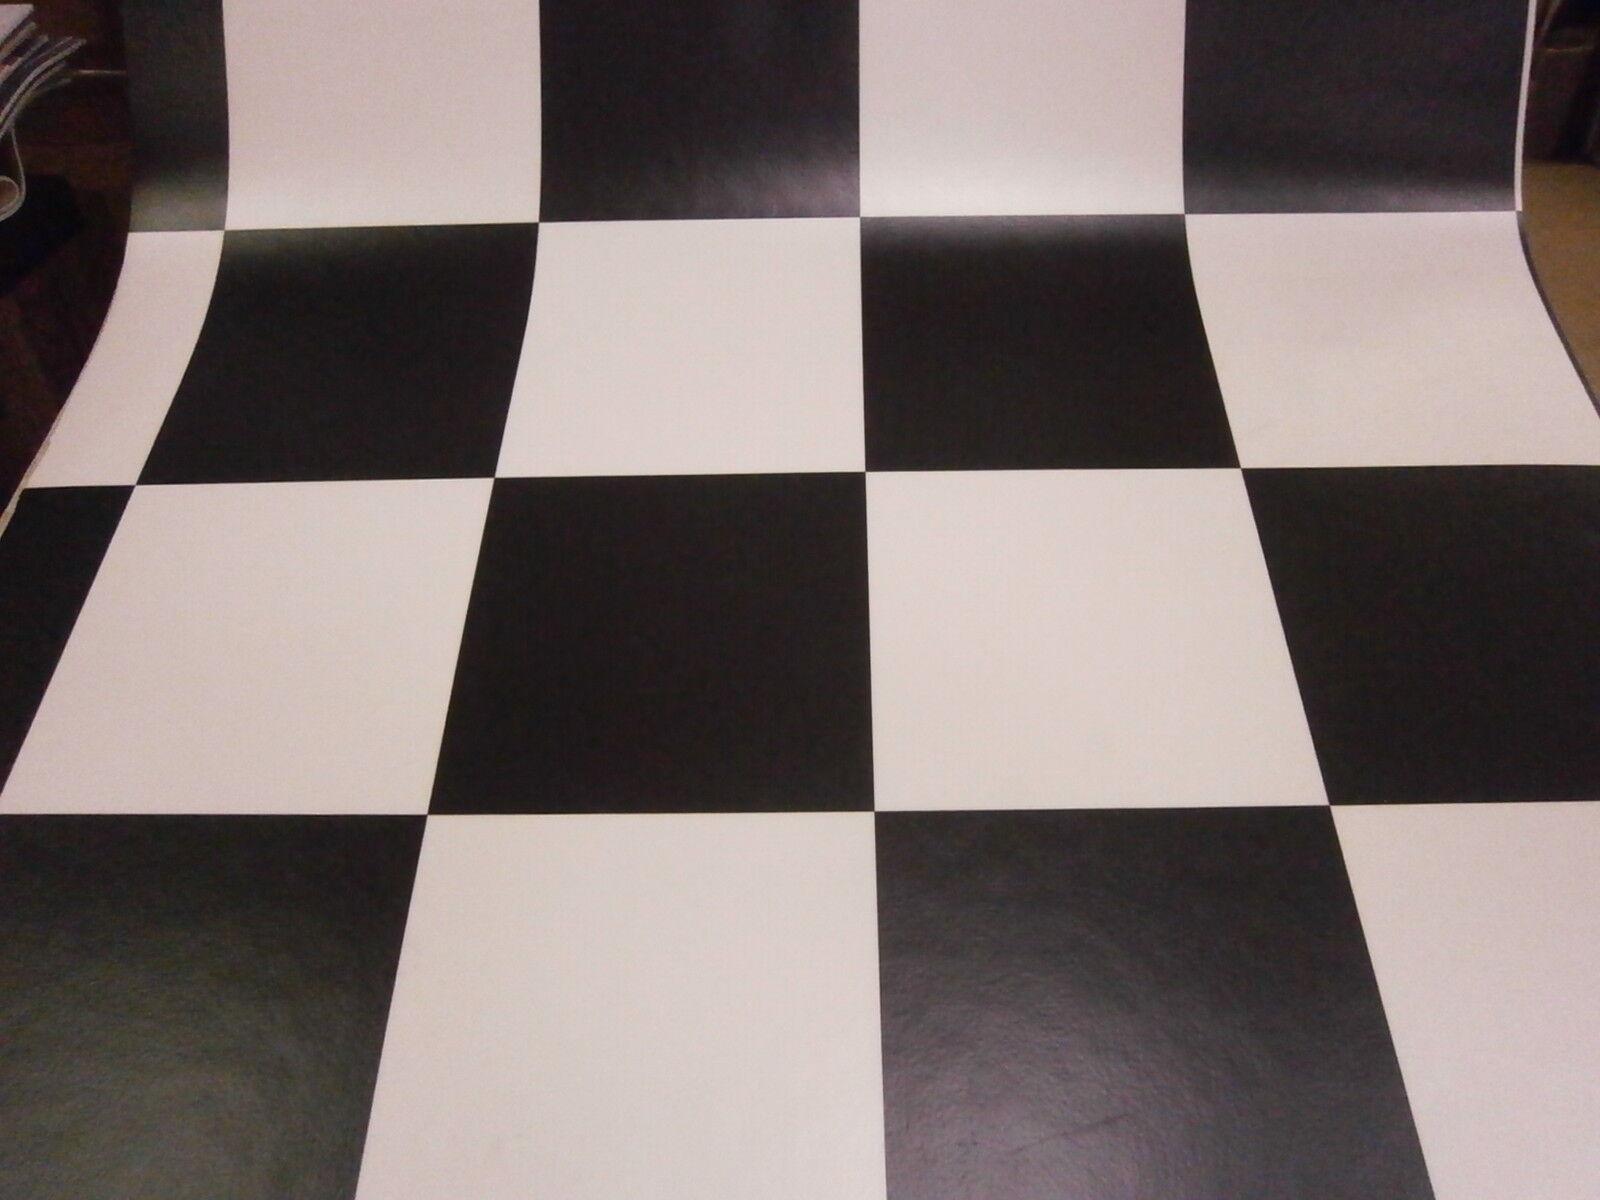 Napa alicante vinyl flooring kitchen bathroom black white for Bathroom designs 3m x 2m